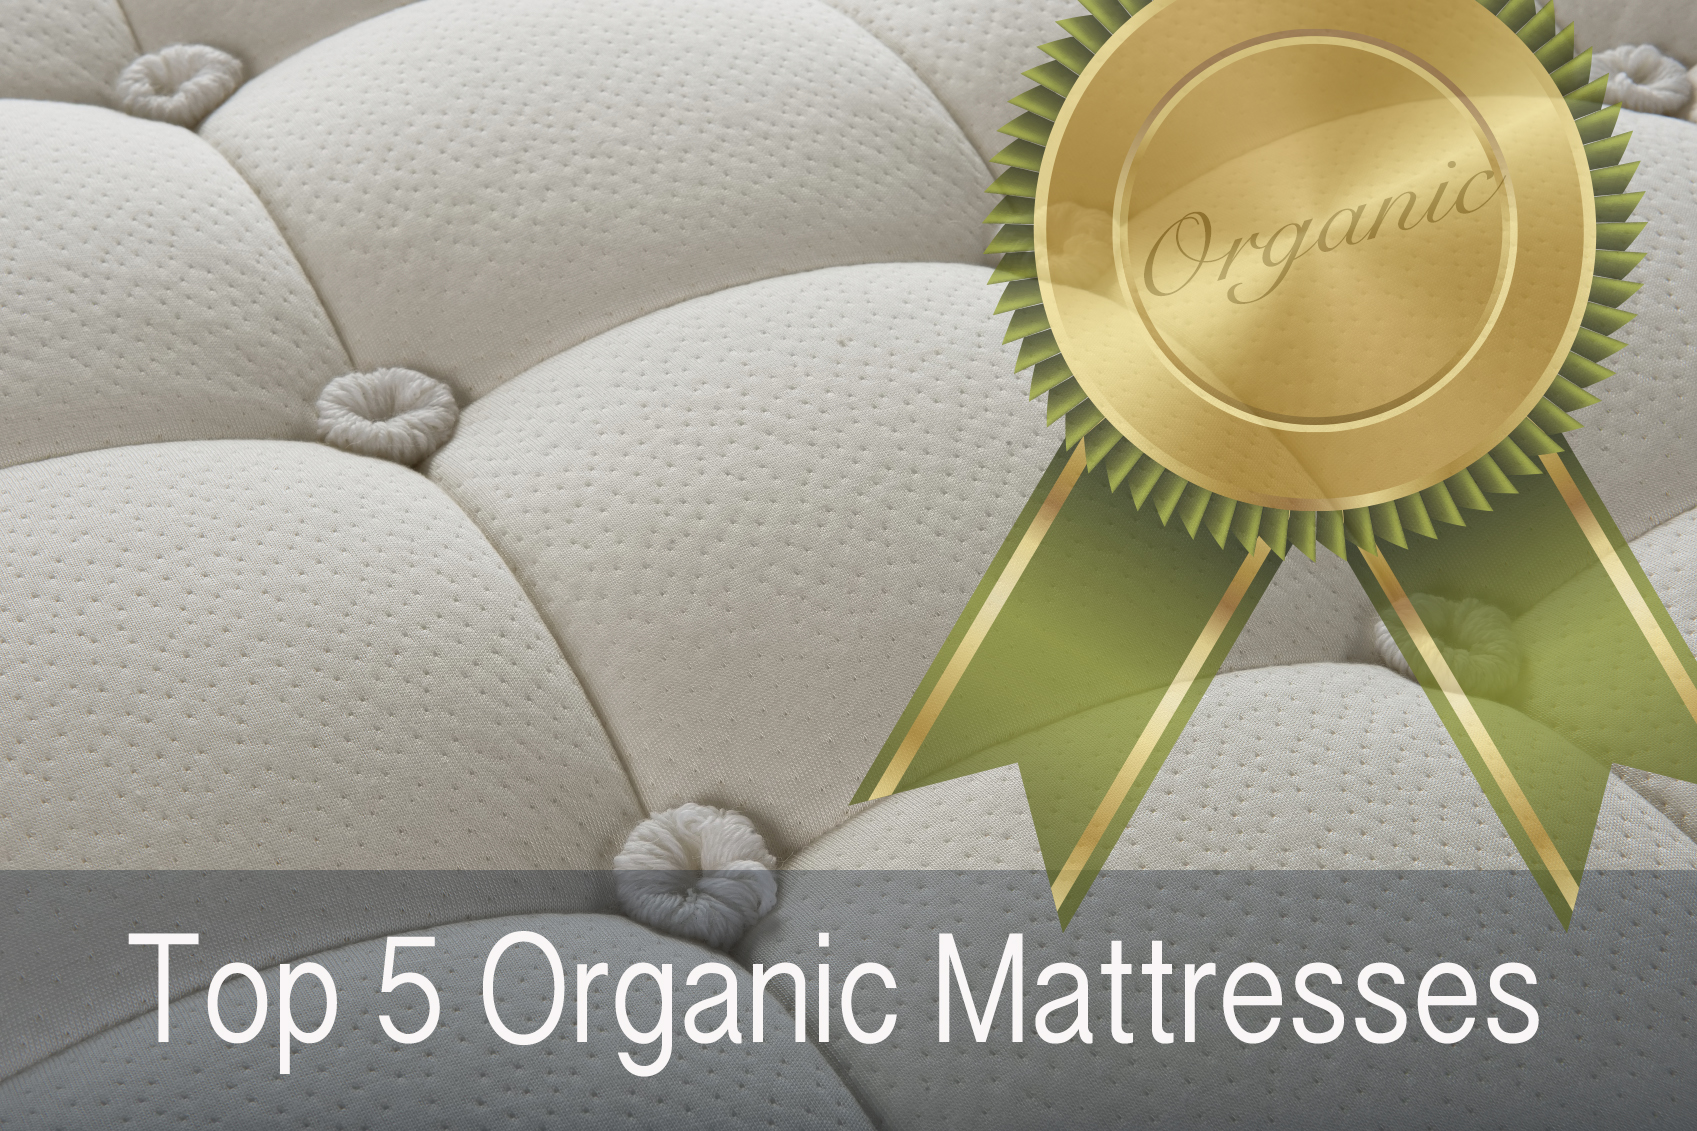 Top 5 Organic Mattresses